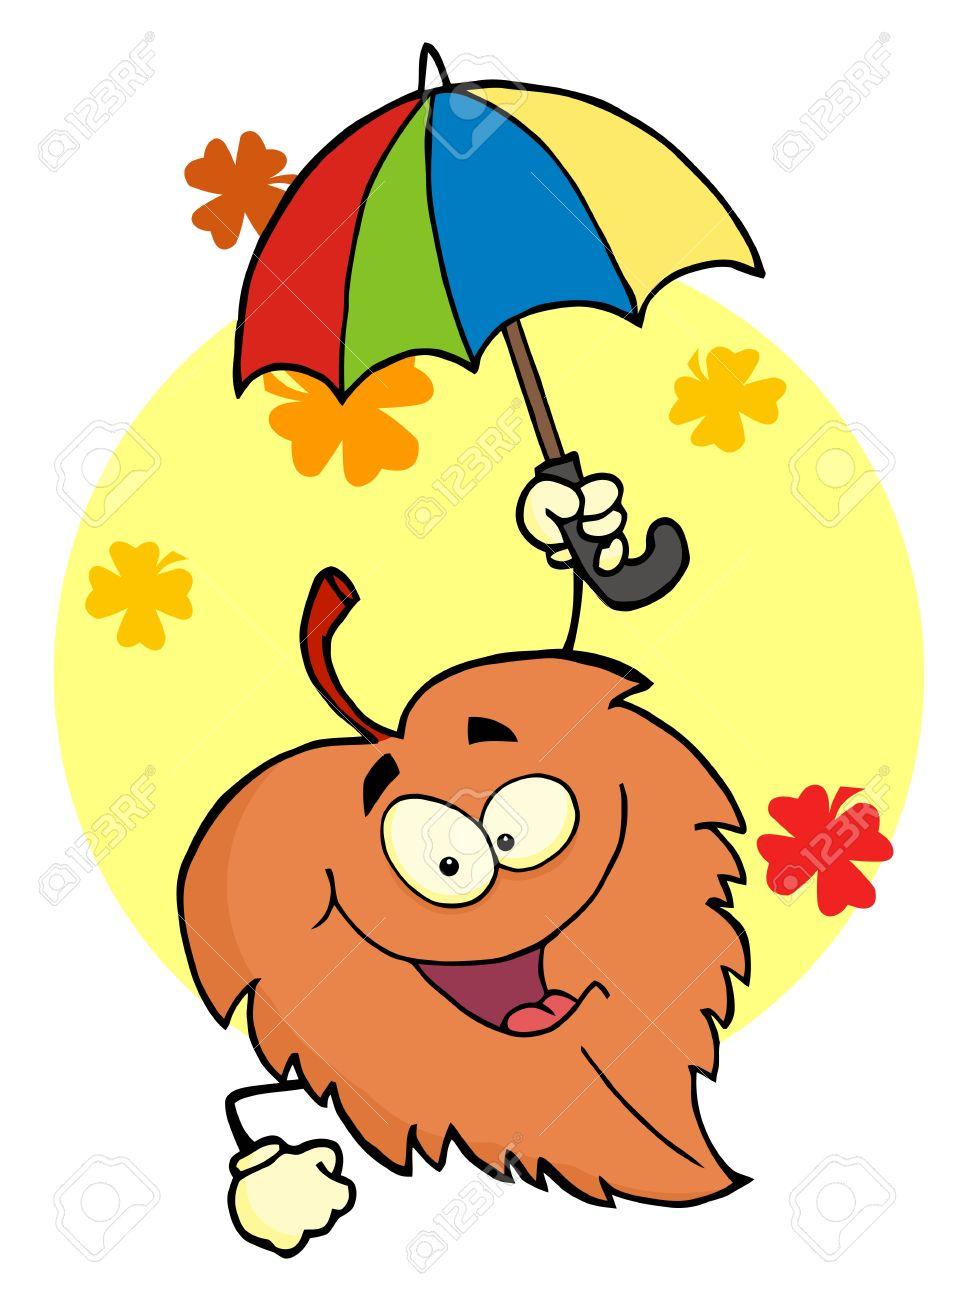 Leaf Cartoon Character With Umbrella Stock Photo - 8283978